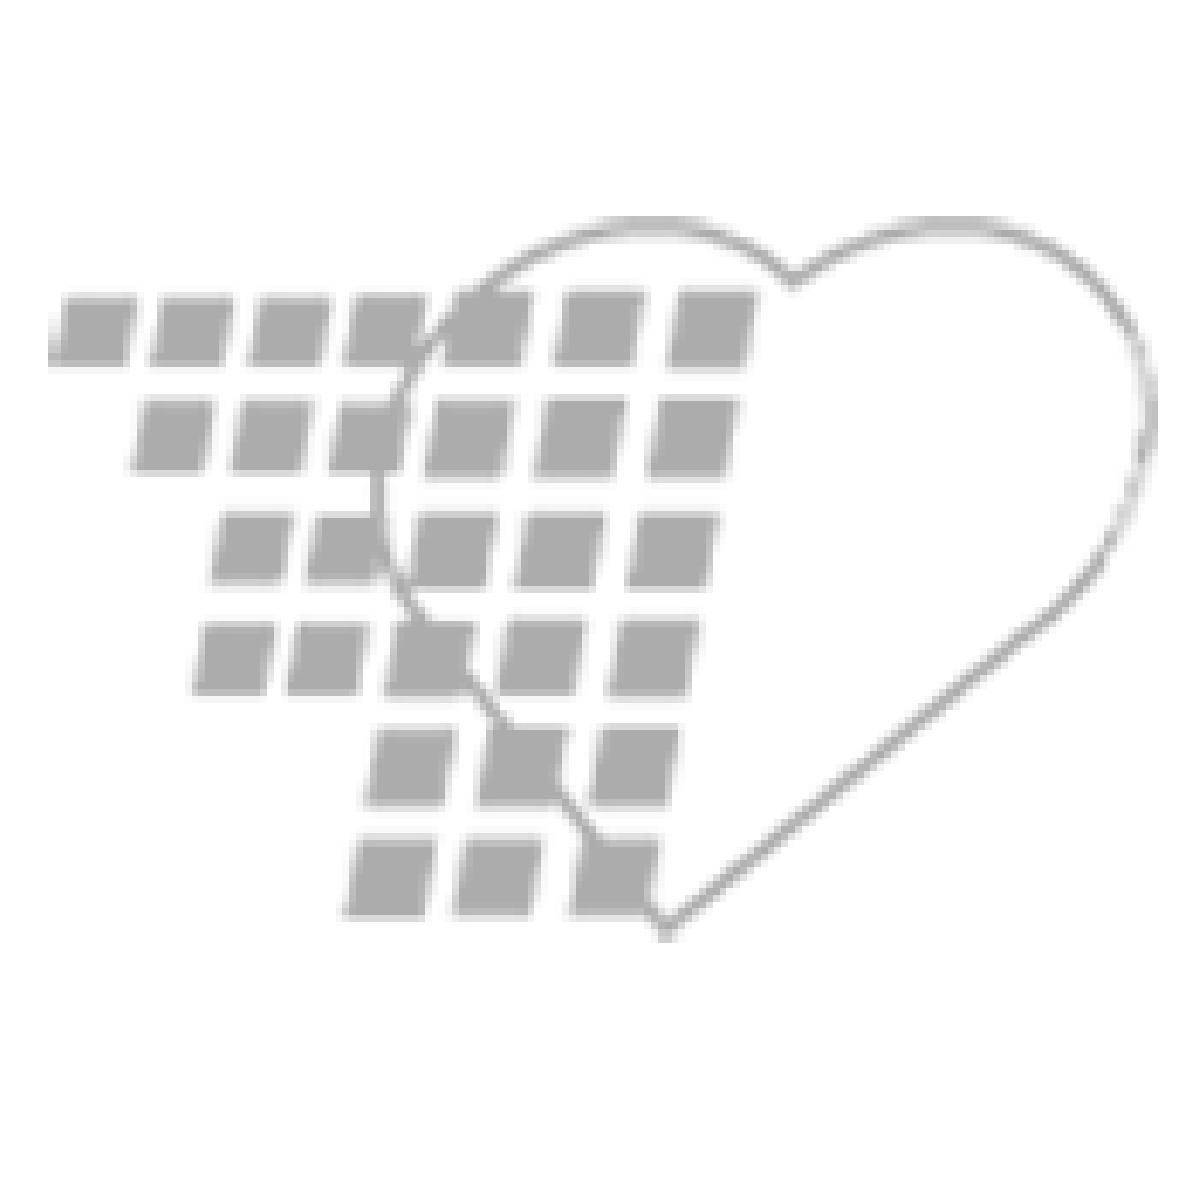 05-46-0221 Kangaroo™ Gastrostomy Feeding Tube with Y-Ports